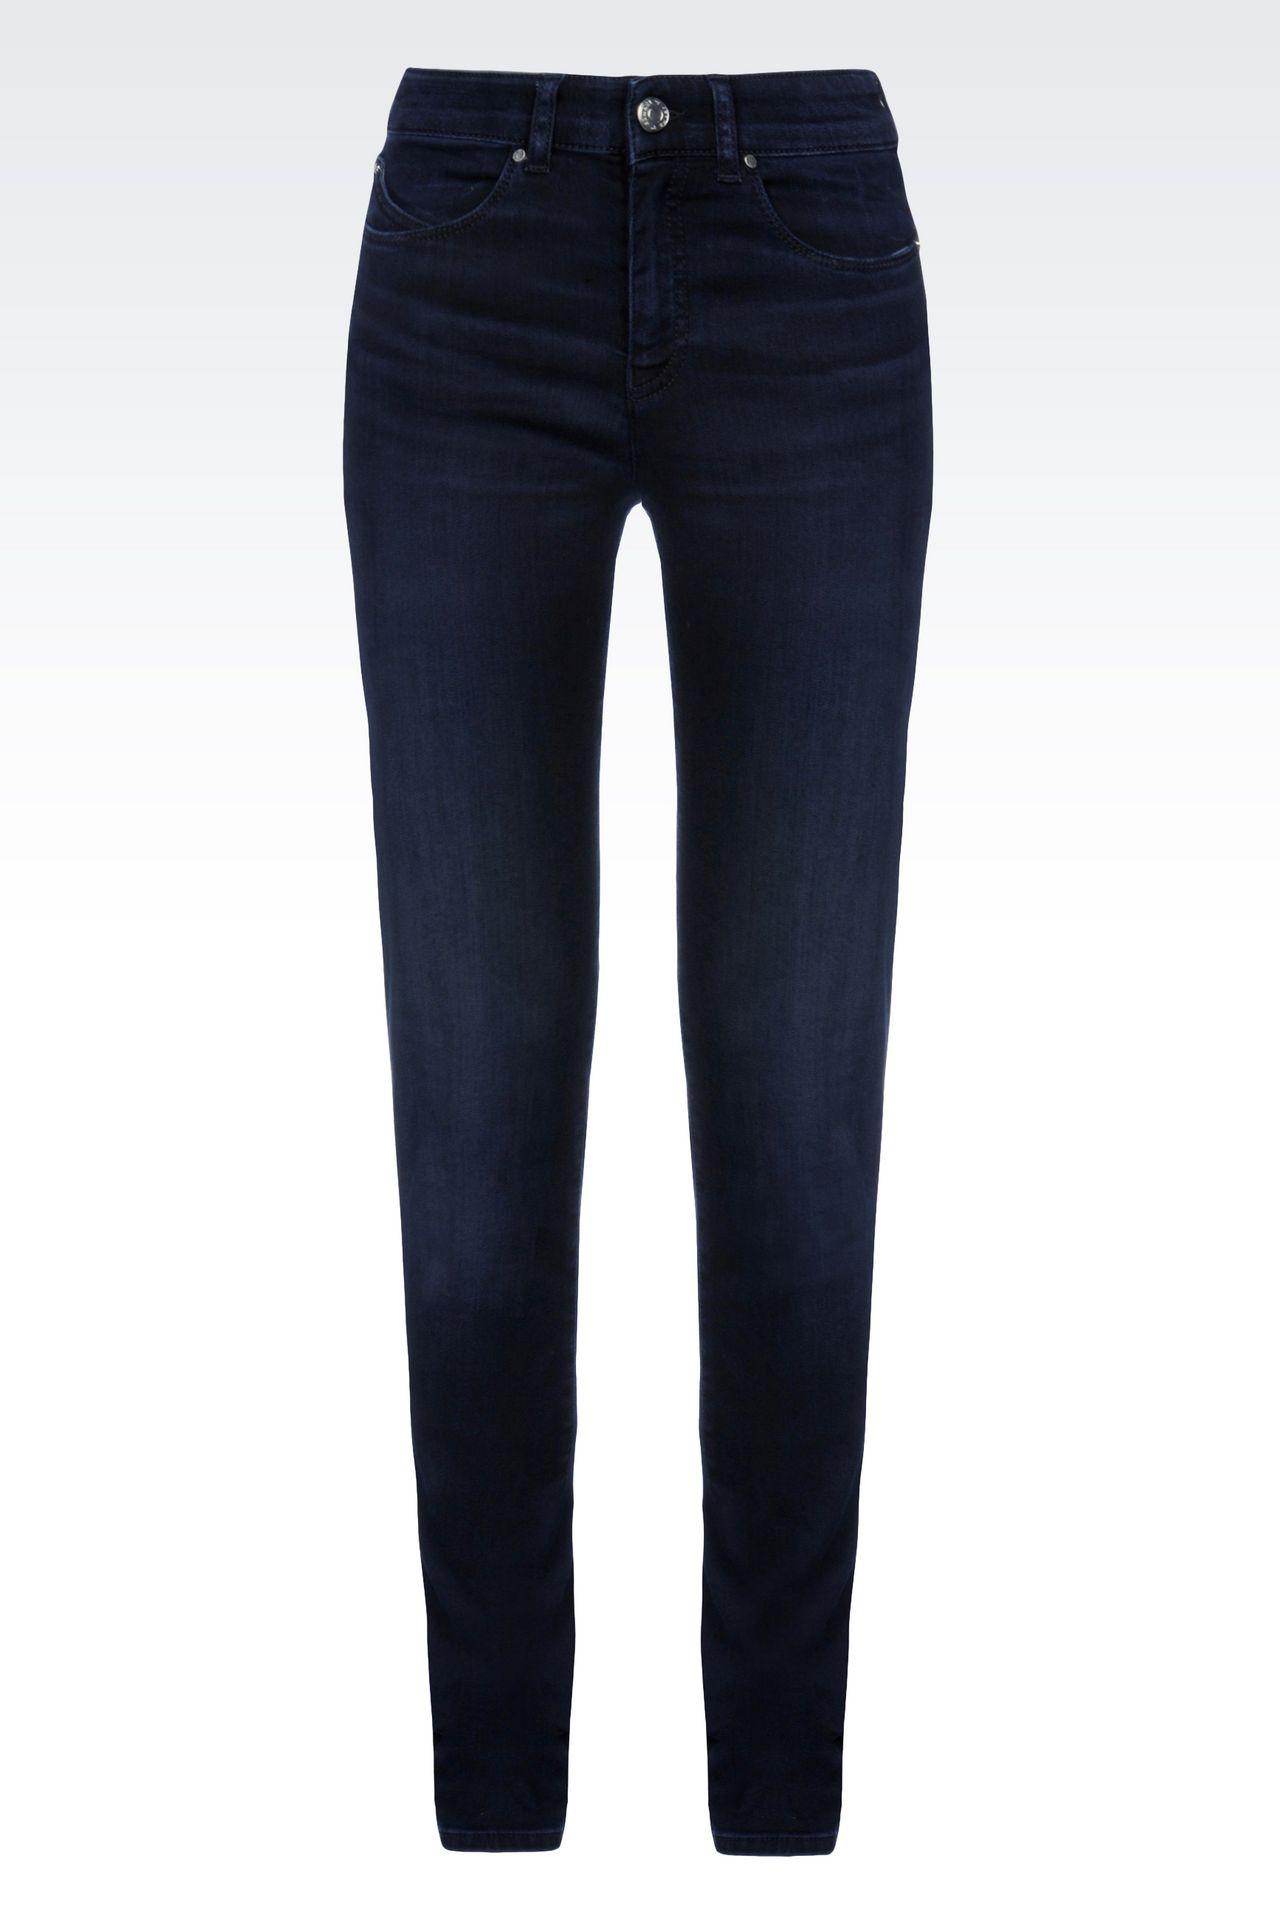 SLIM FIT HIGH-WAIST BLACK WASH JEANS: Jeans Women by Armani - 0